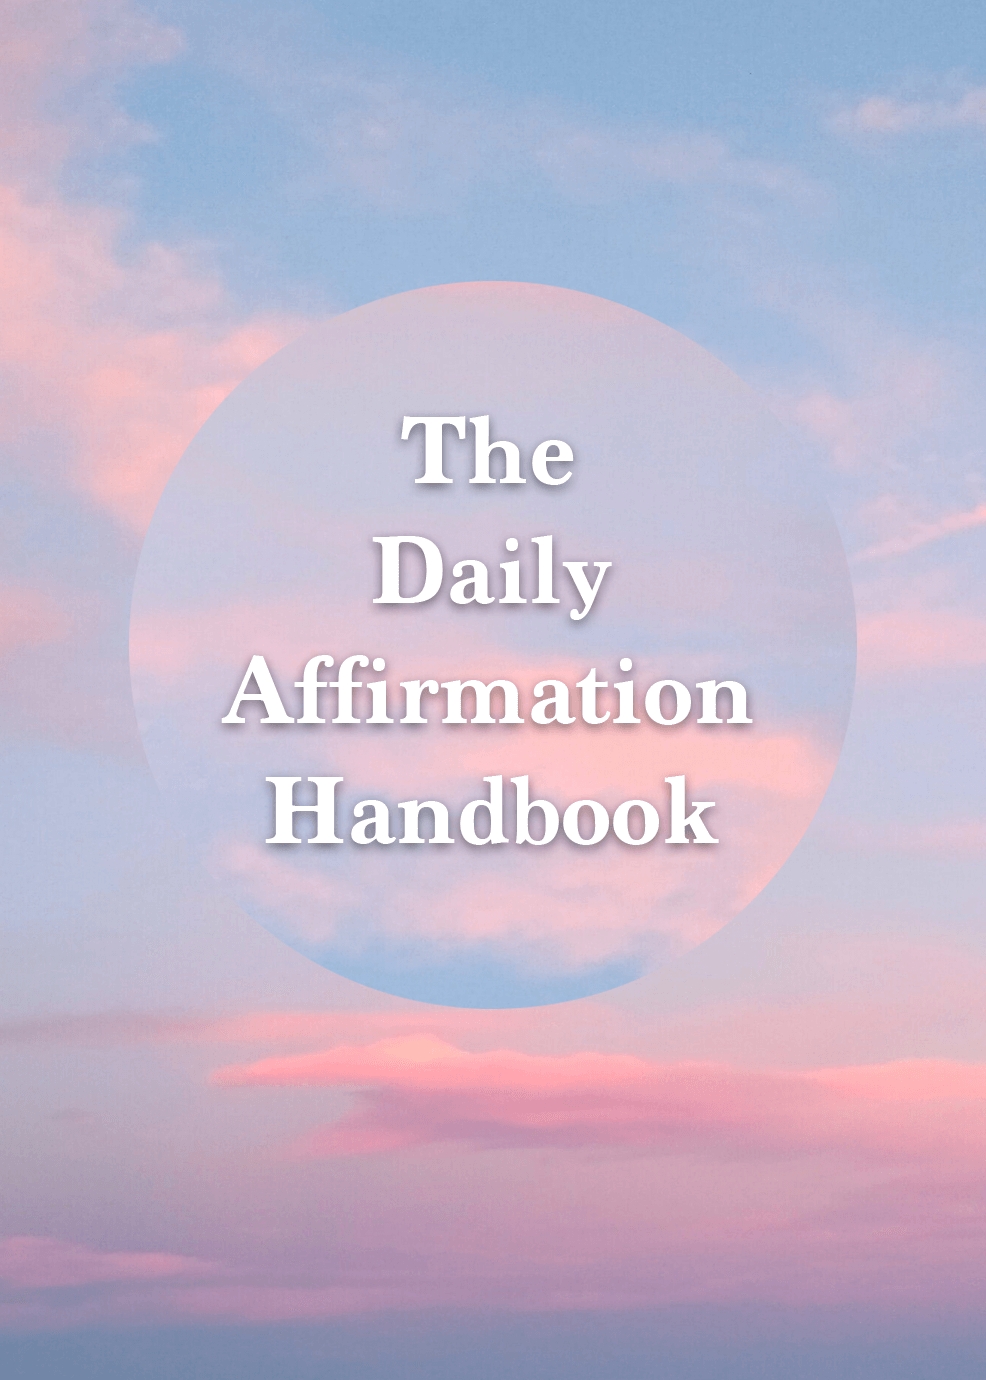 The Daily Affirmation Handbook Video Upgrade